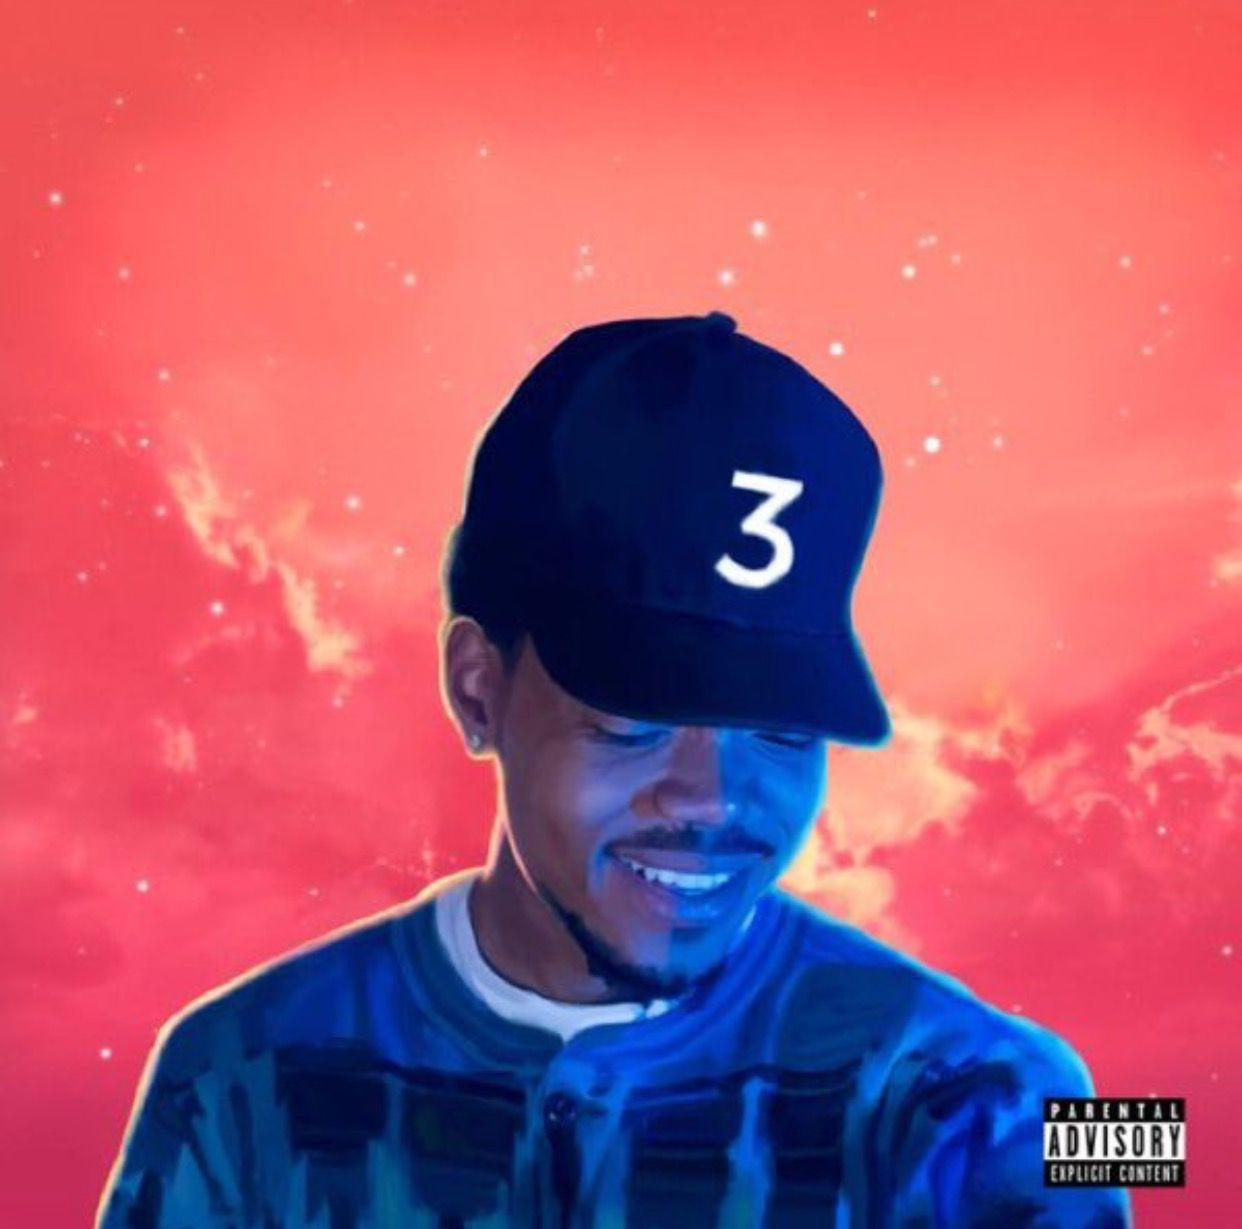 Chance The Rapper 3 Coloring Book Album Chance The Rapper Cool Album Covers